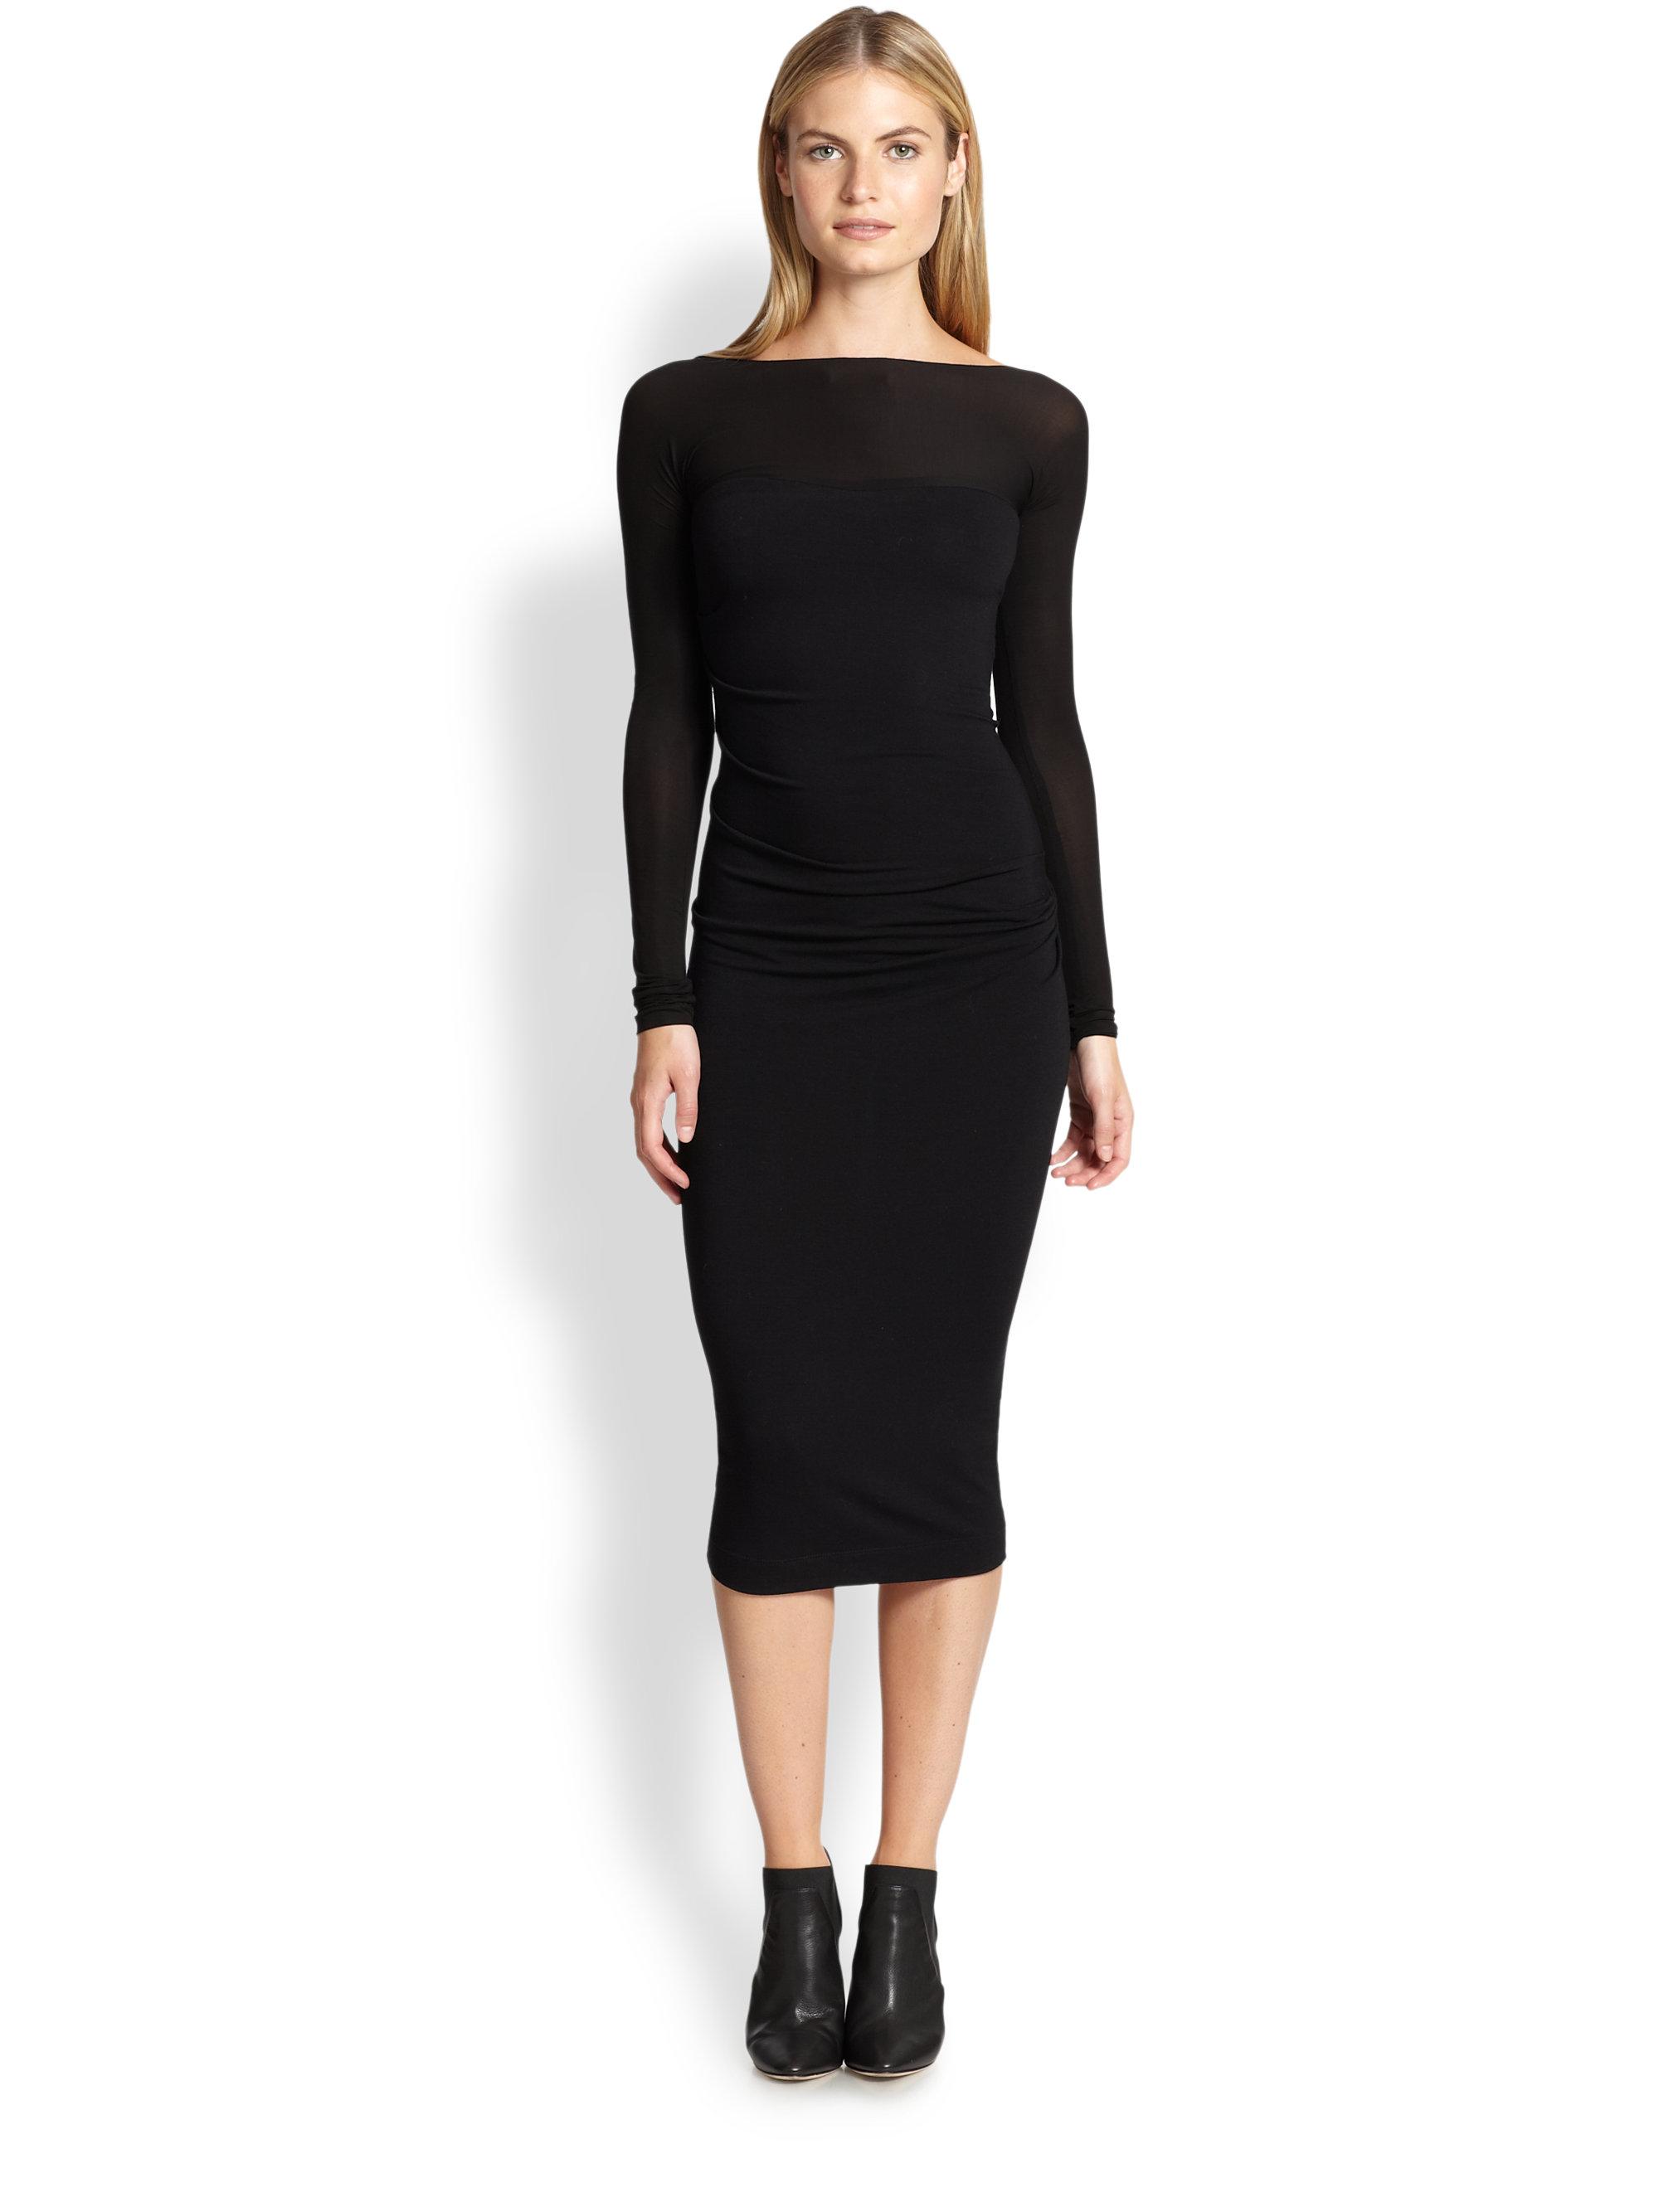 Black dress jersey - Gallery